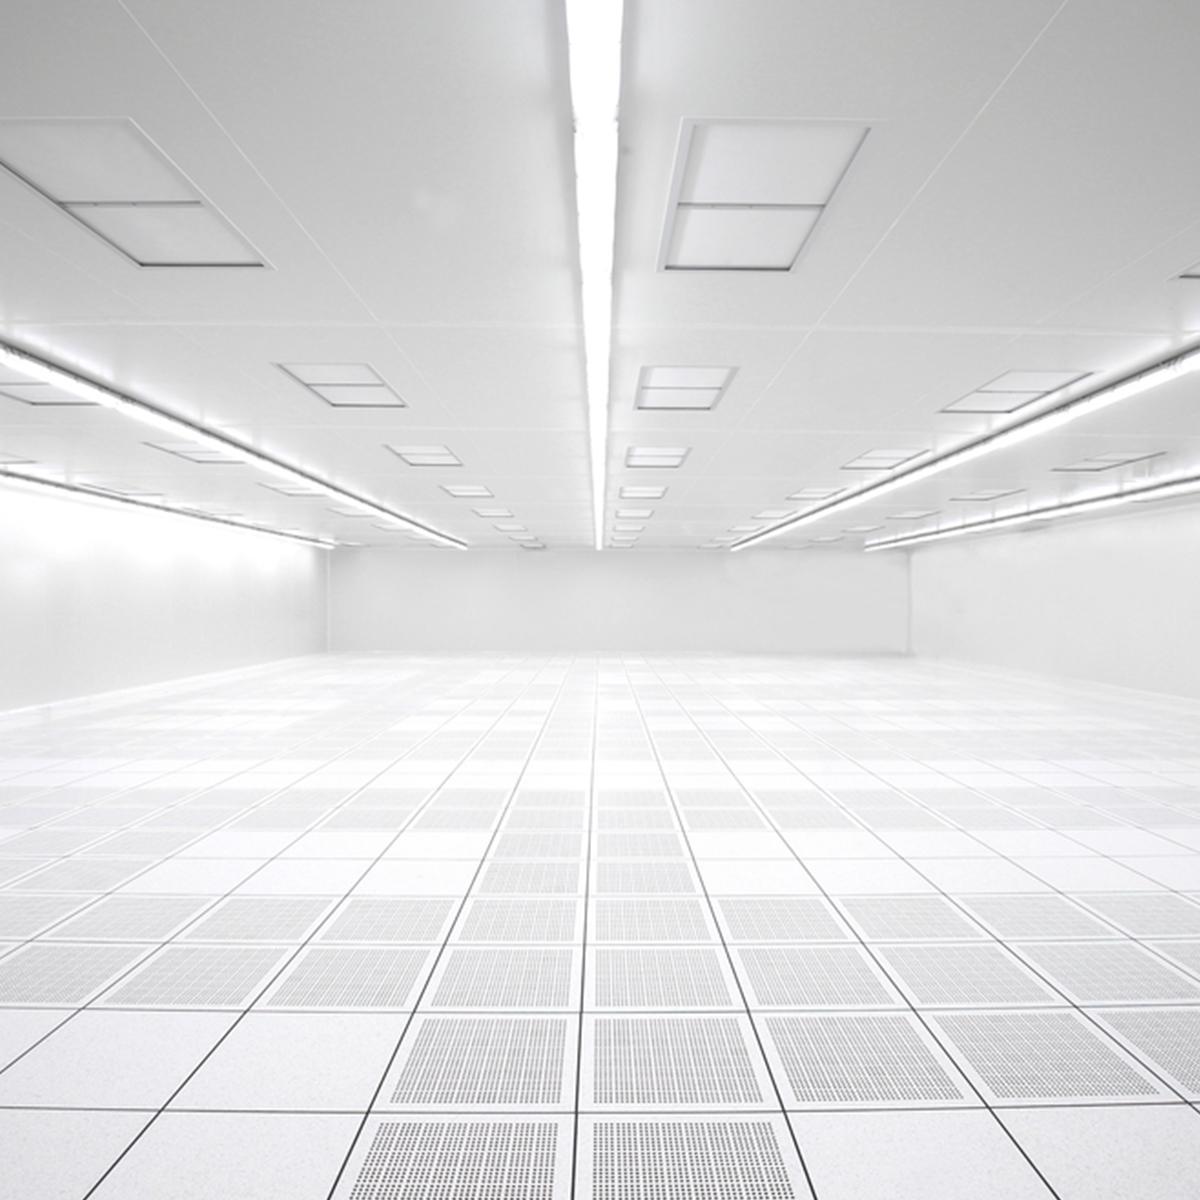 sala blanca